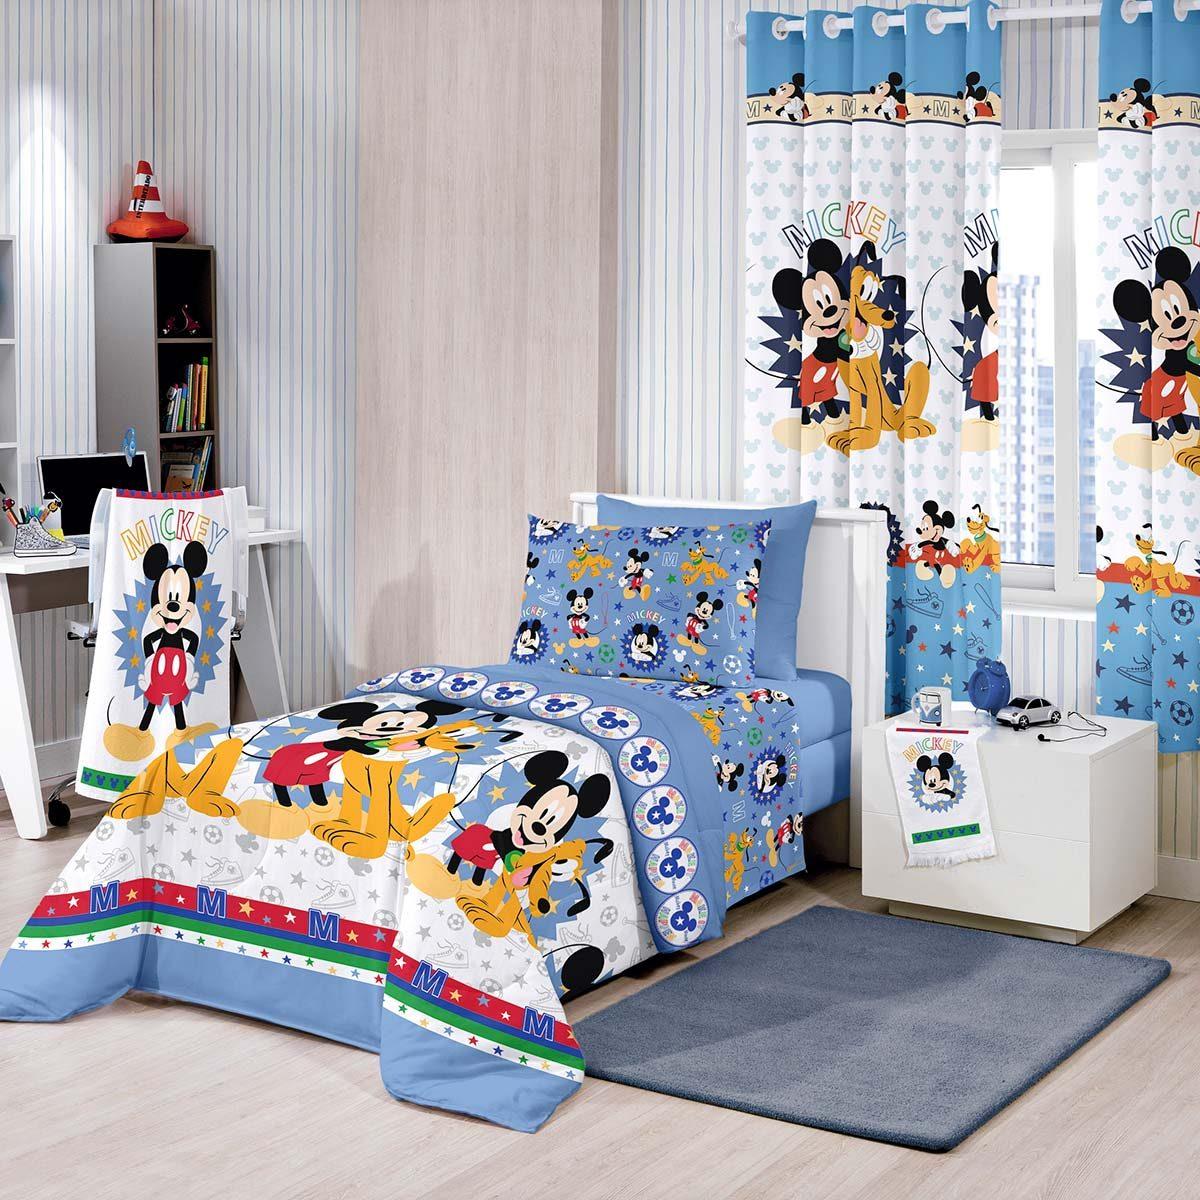 7cc41c5d03 edredom infantil mickey happy disney santista. Carregando zoom.